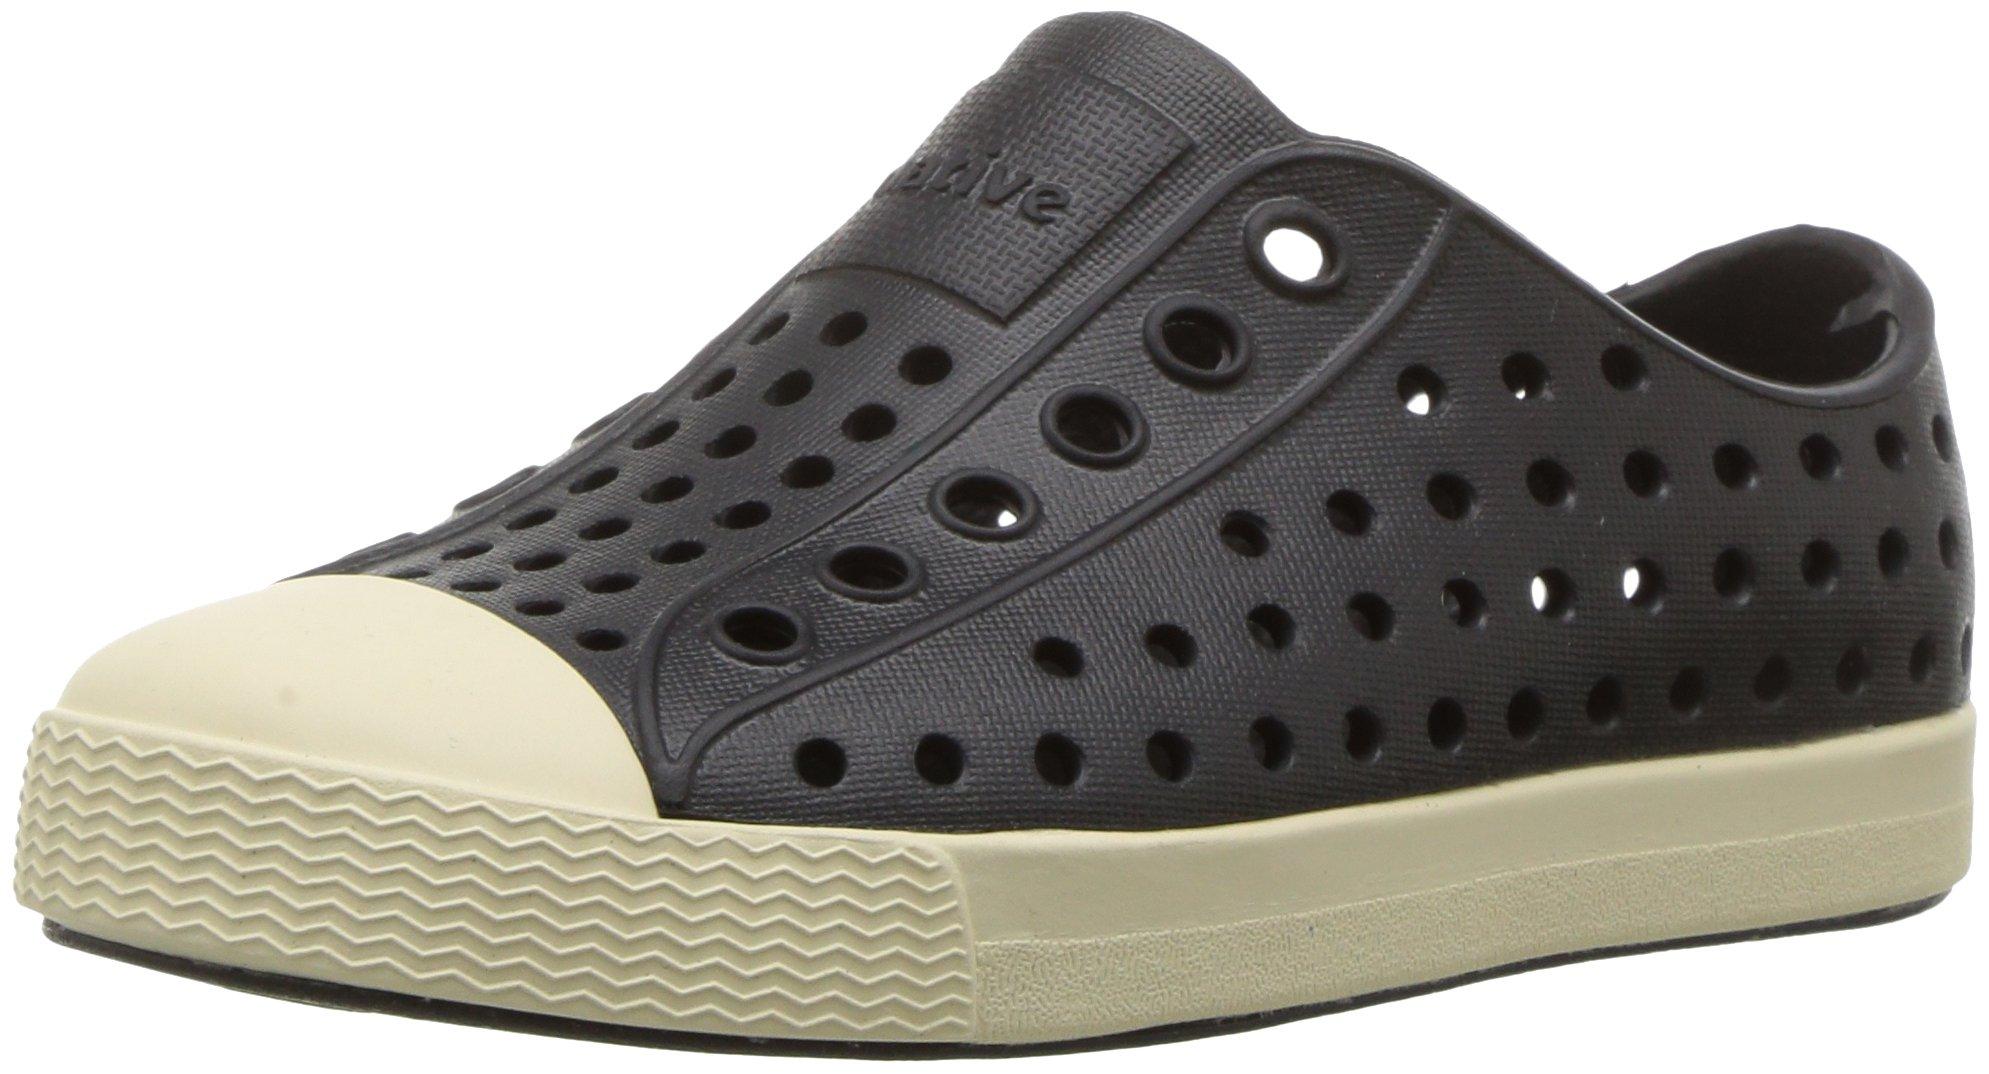 Native Kids Shoes Unisex Jefferson (Toddler/Little Kid) Jiffy Black Sneaker 4 Toddler M